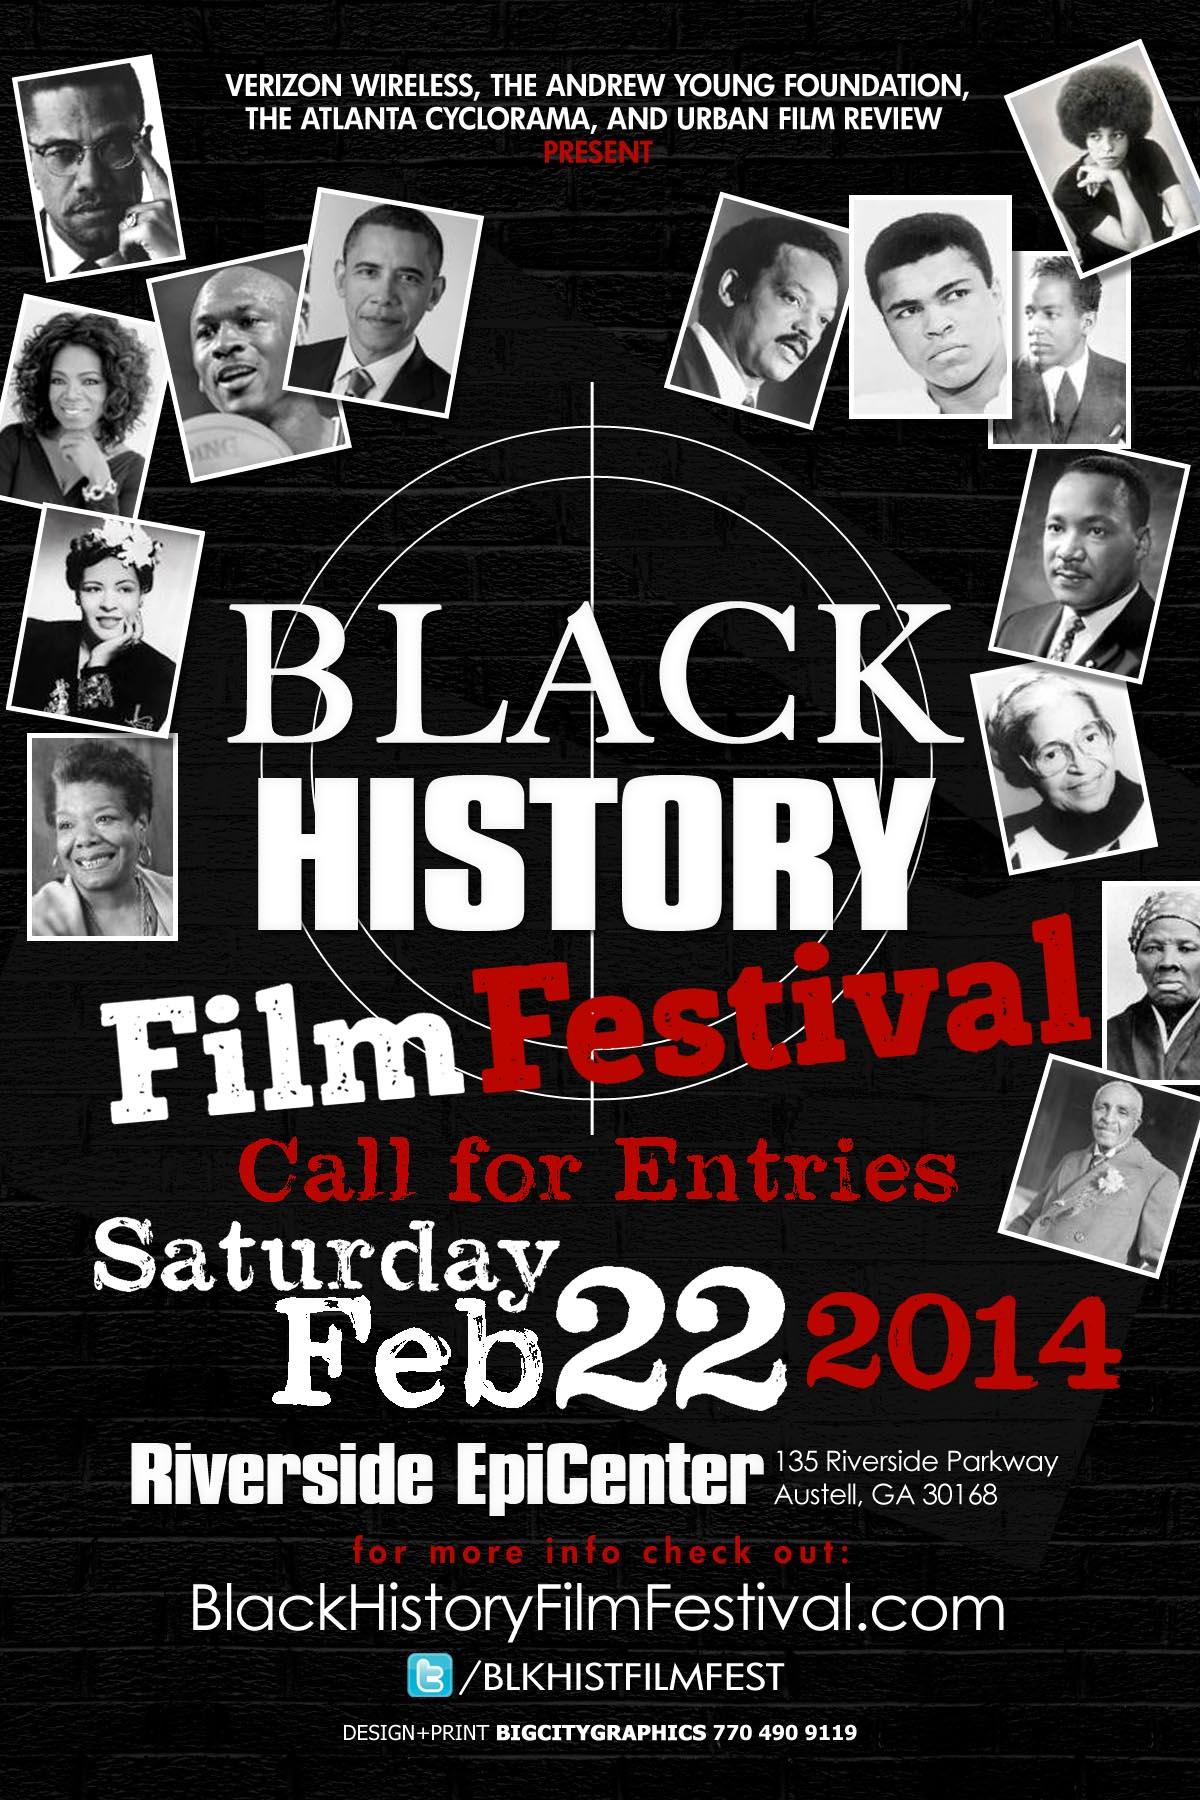 2014 Black History Film Festival